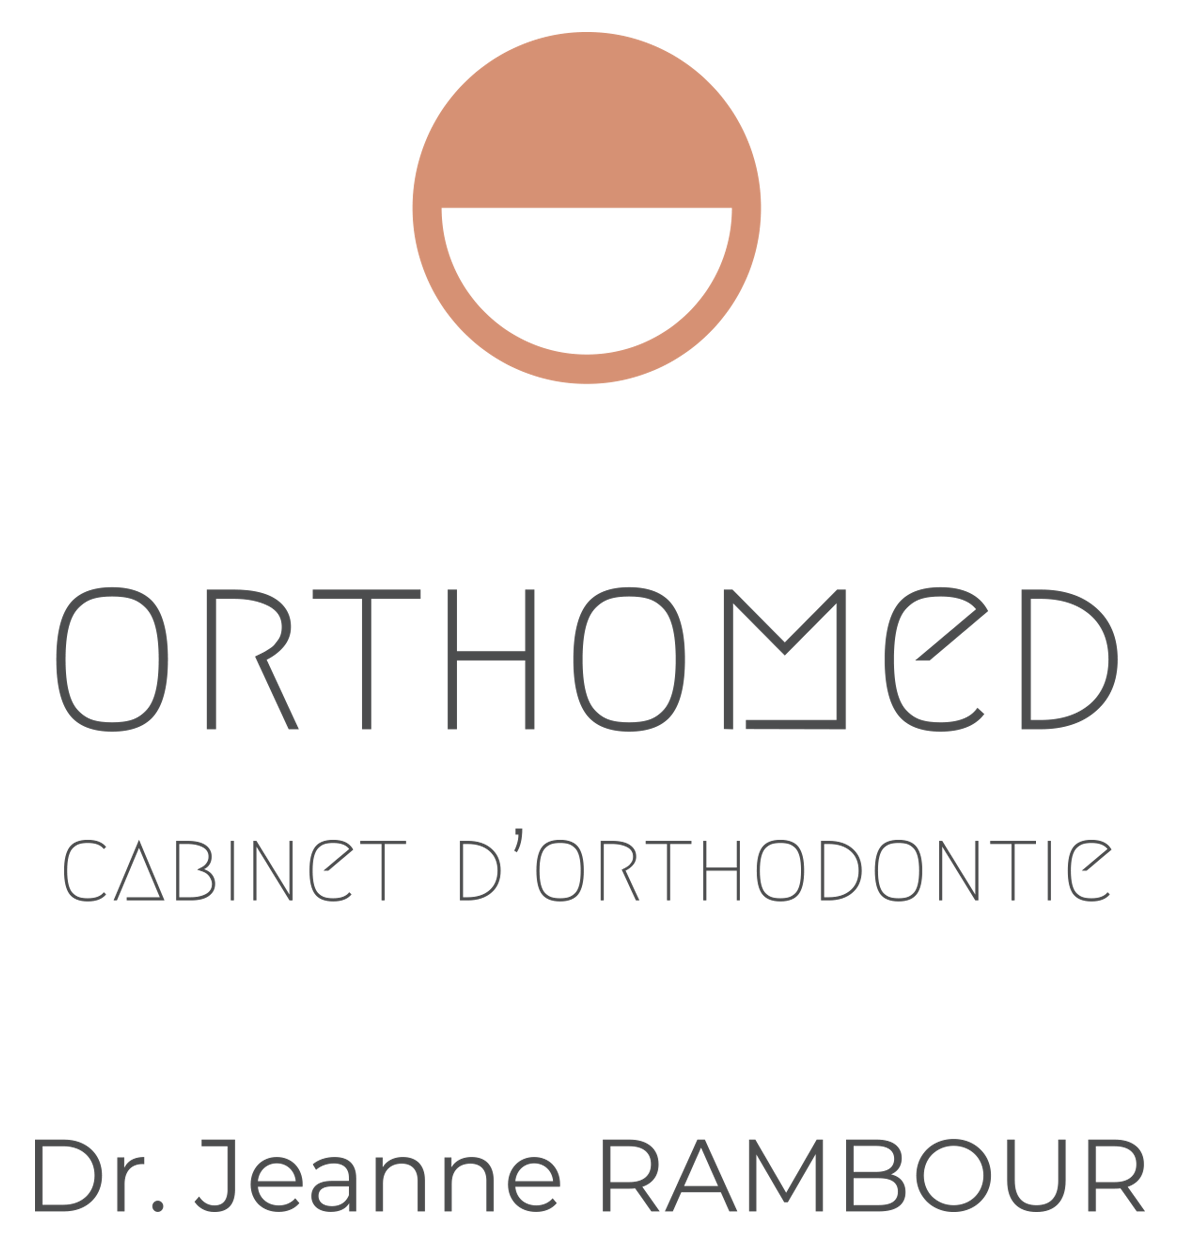 Cabinet Orthomed